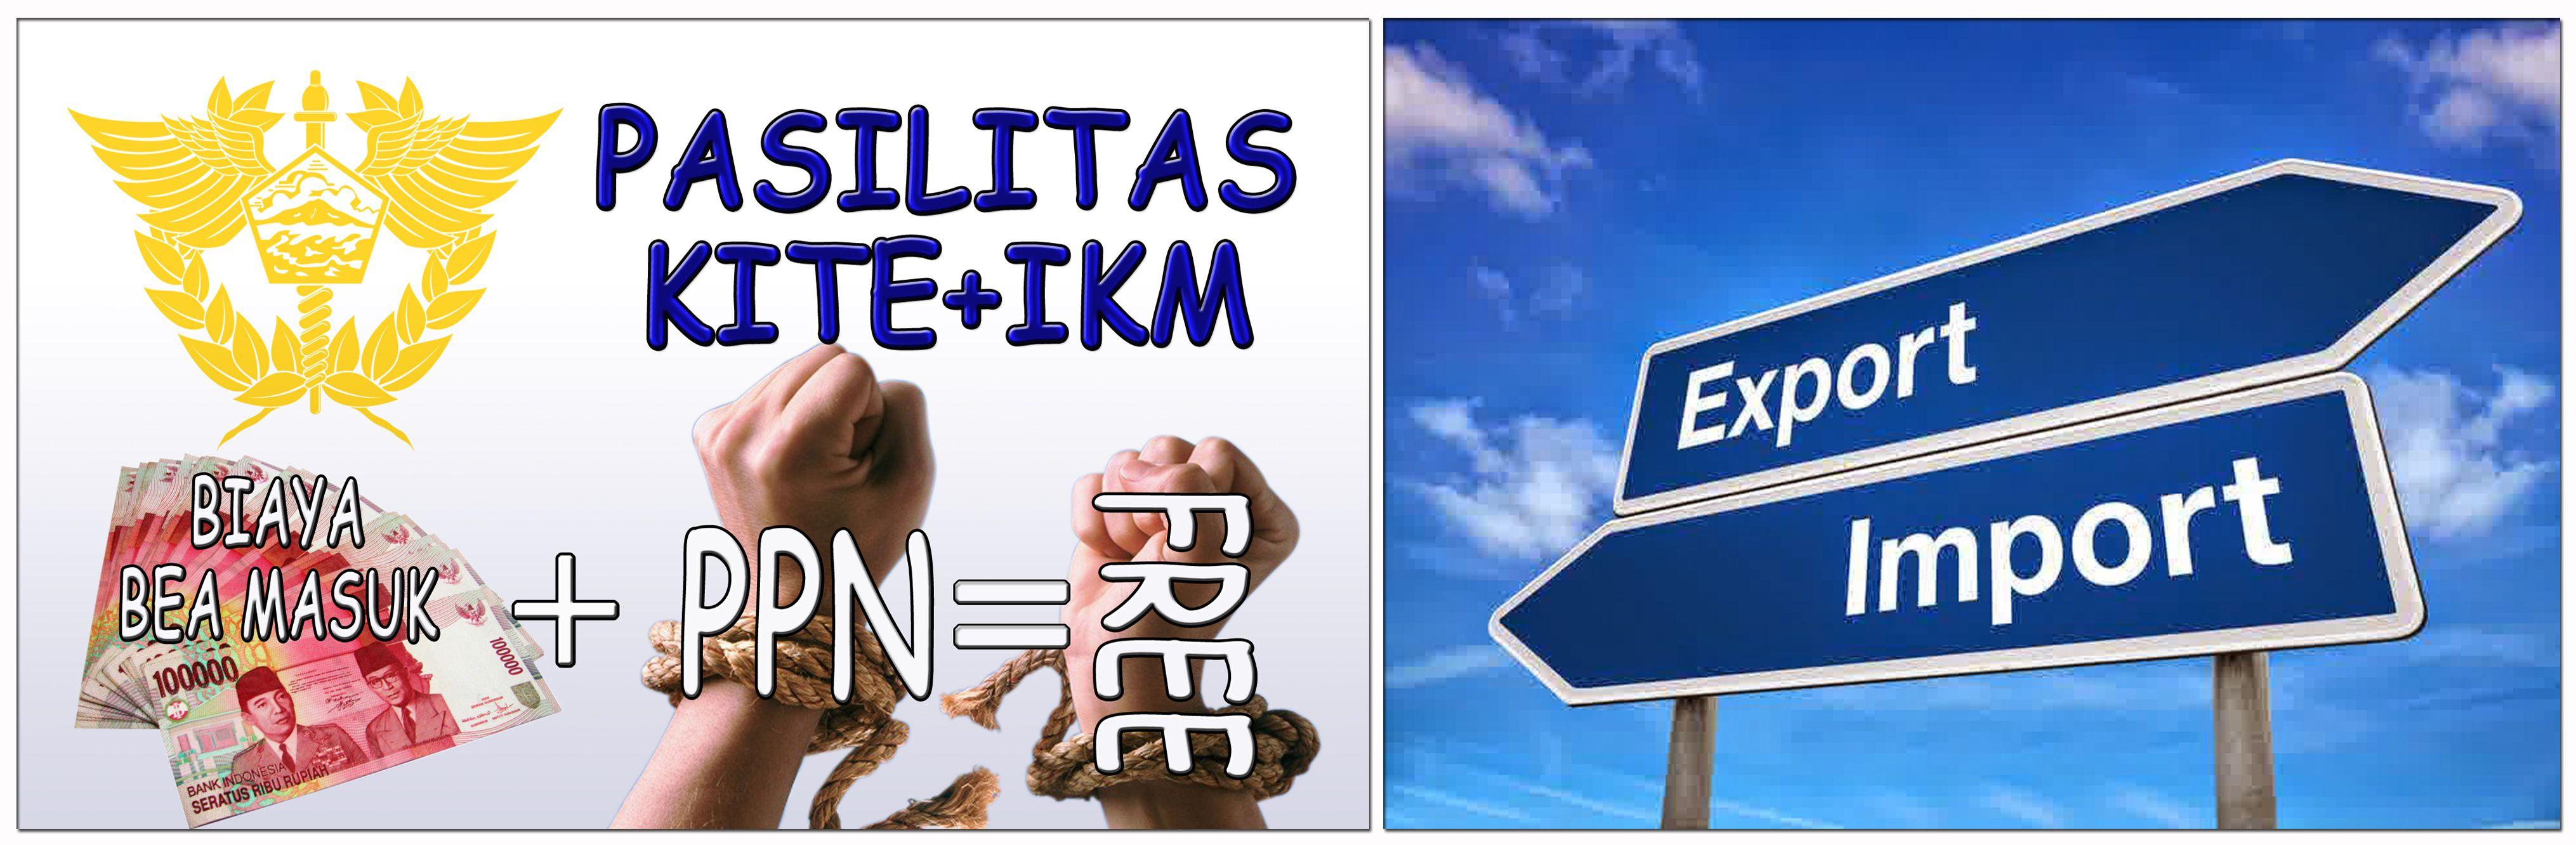 http://www.perizinanindonesia.com/upload/Bebas%20Biaya%20Kite.jpg